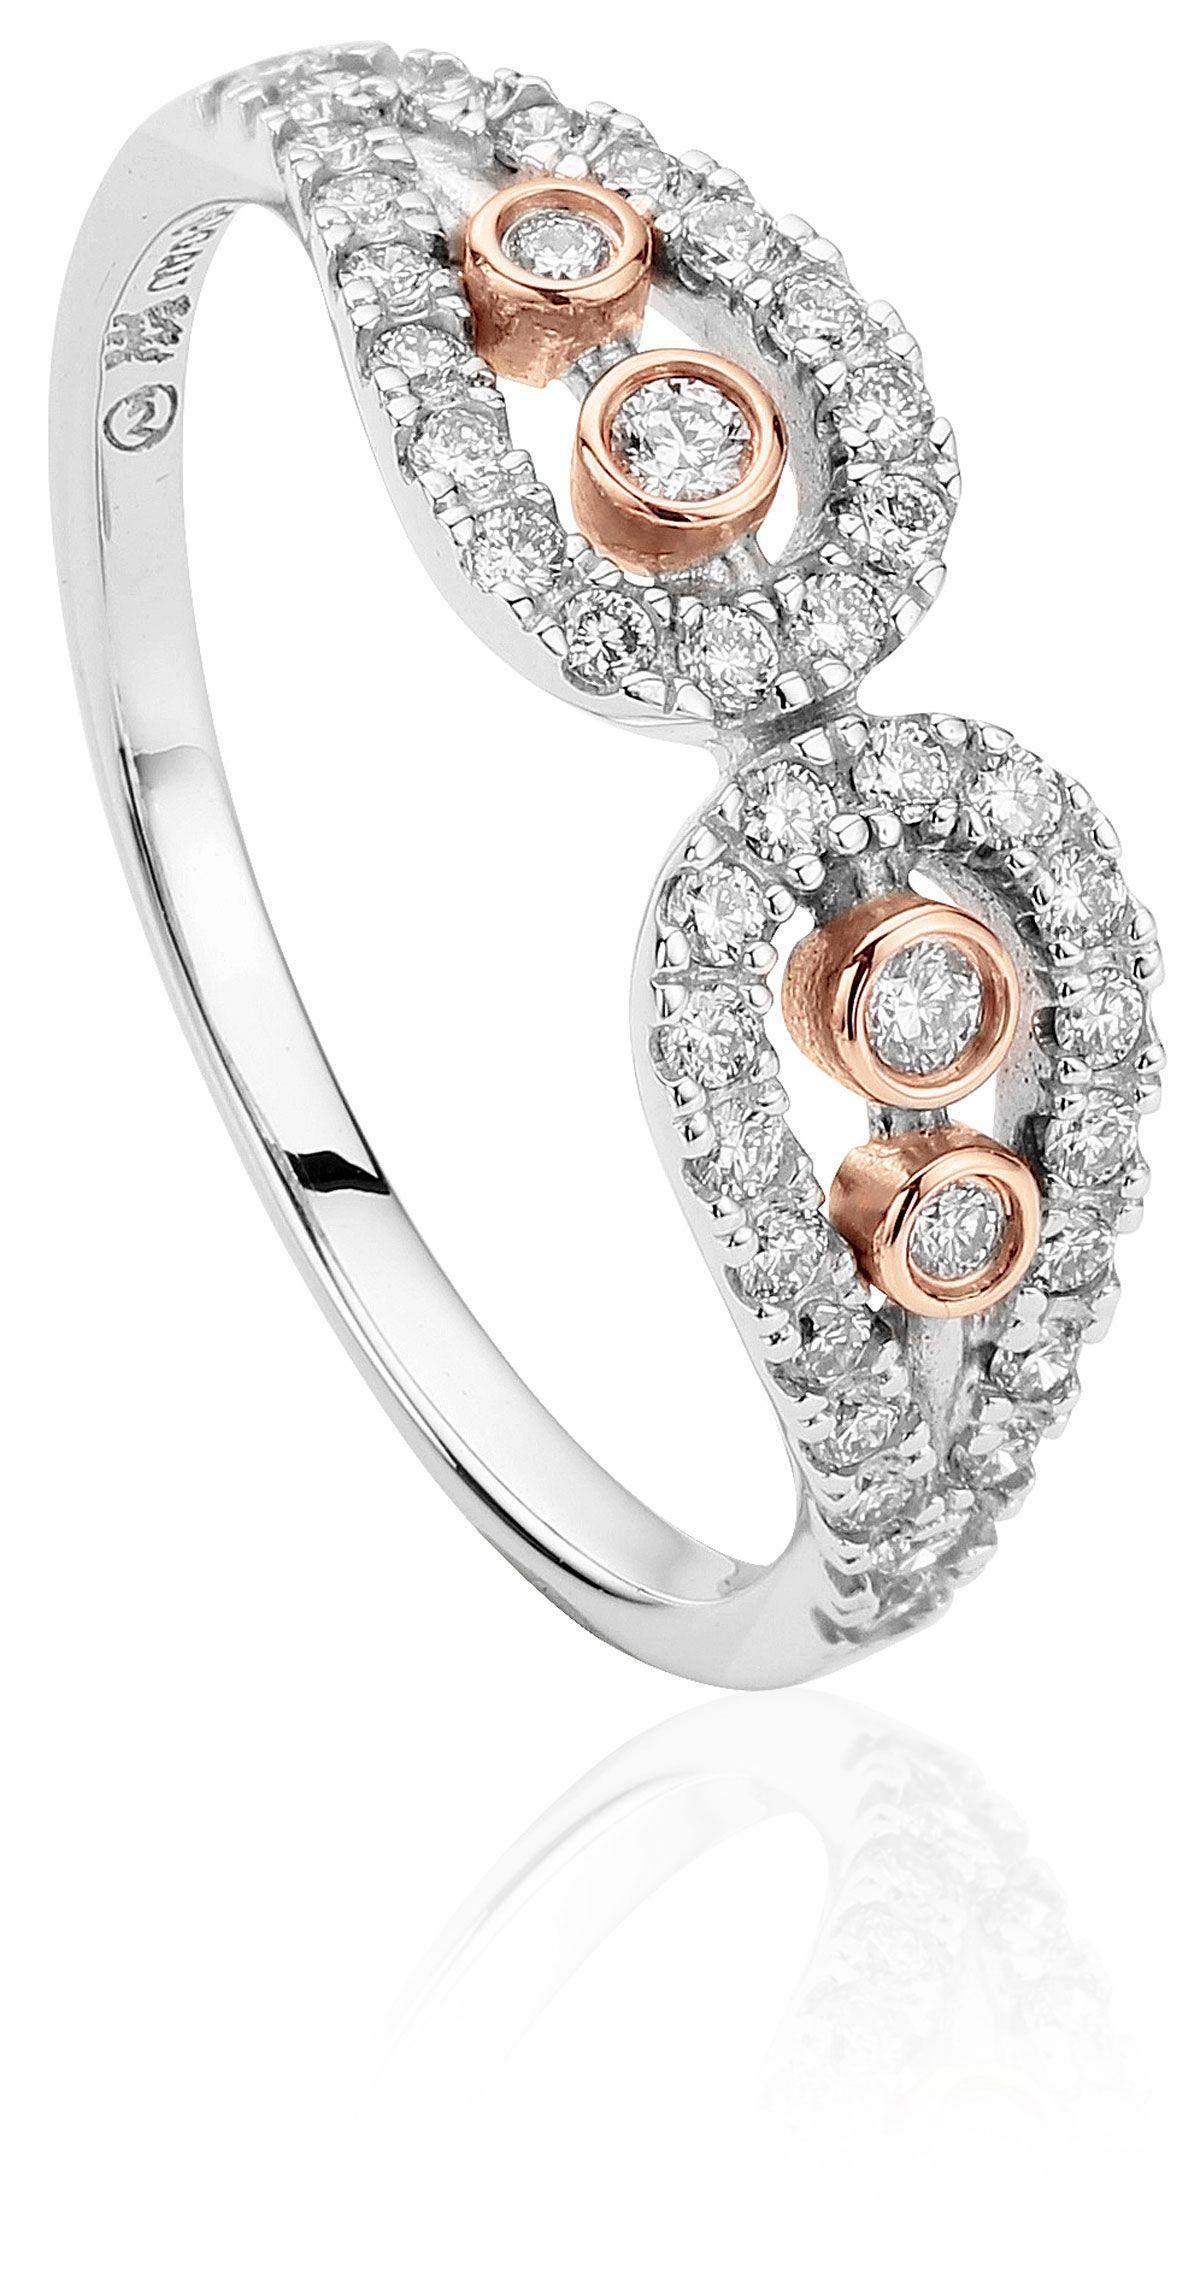 Royal Crown Diamond Ring Diamond rings for sale, Wedding